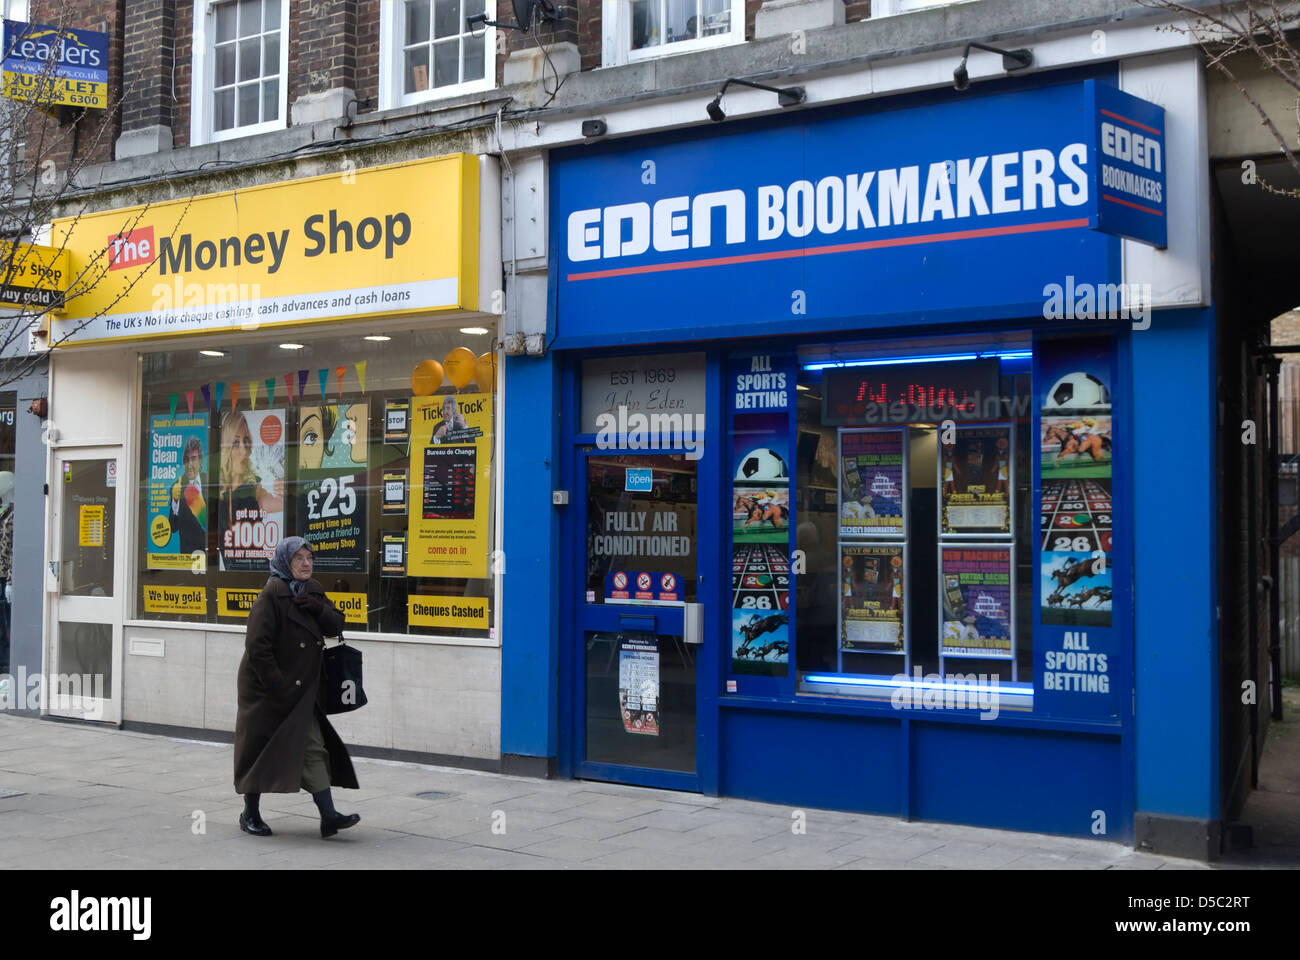 corbett sports betting shops in england